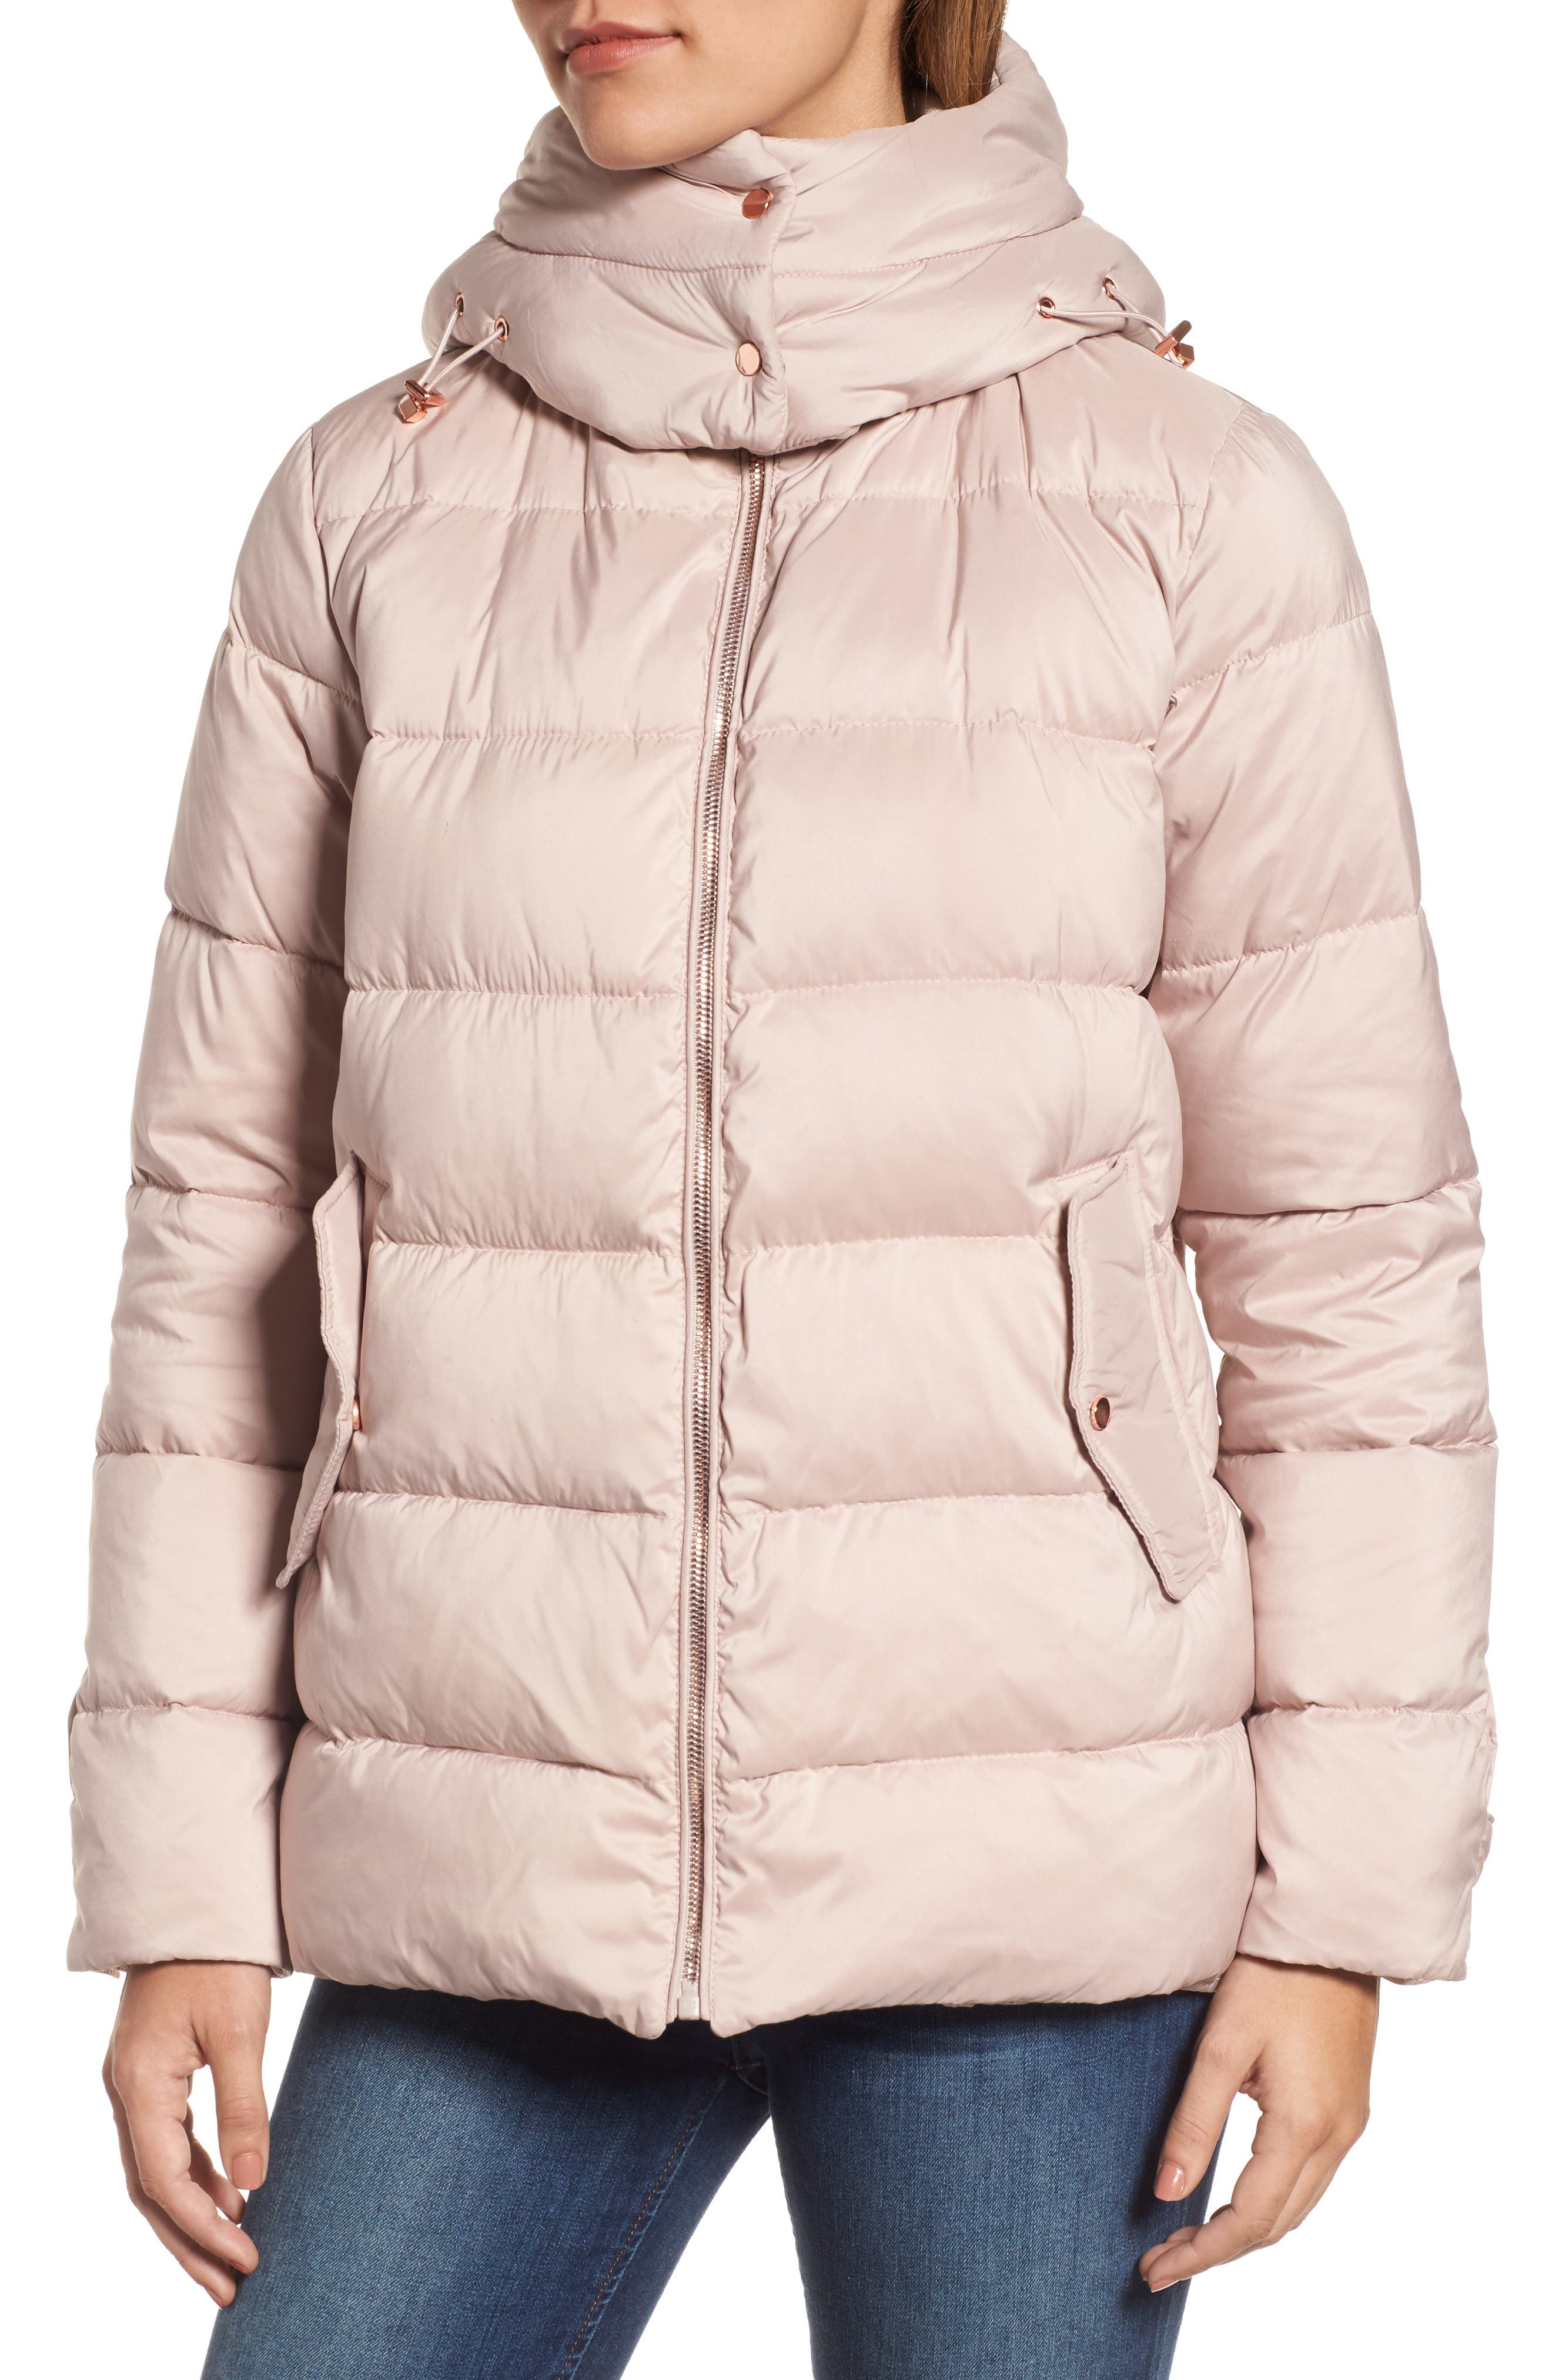 Hooded Puffer Jacket,                             Alternate thumbnail 5, color,                             Petal Pink